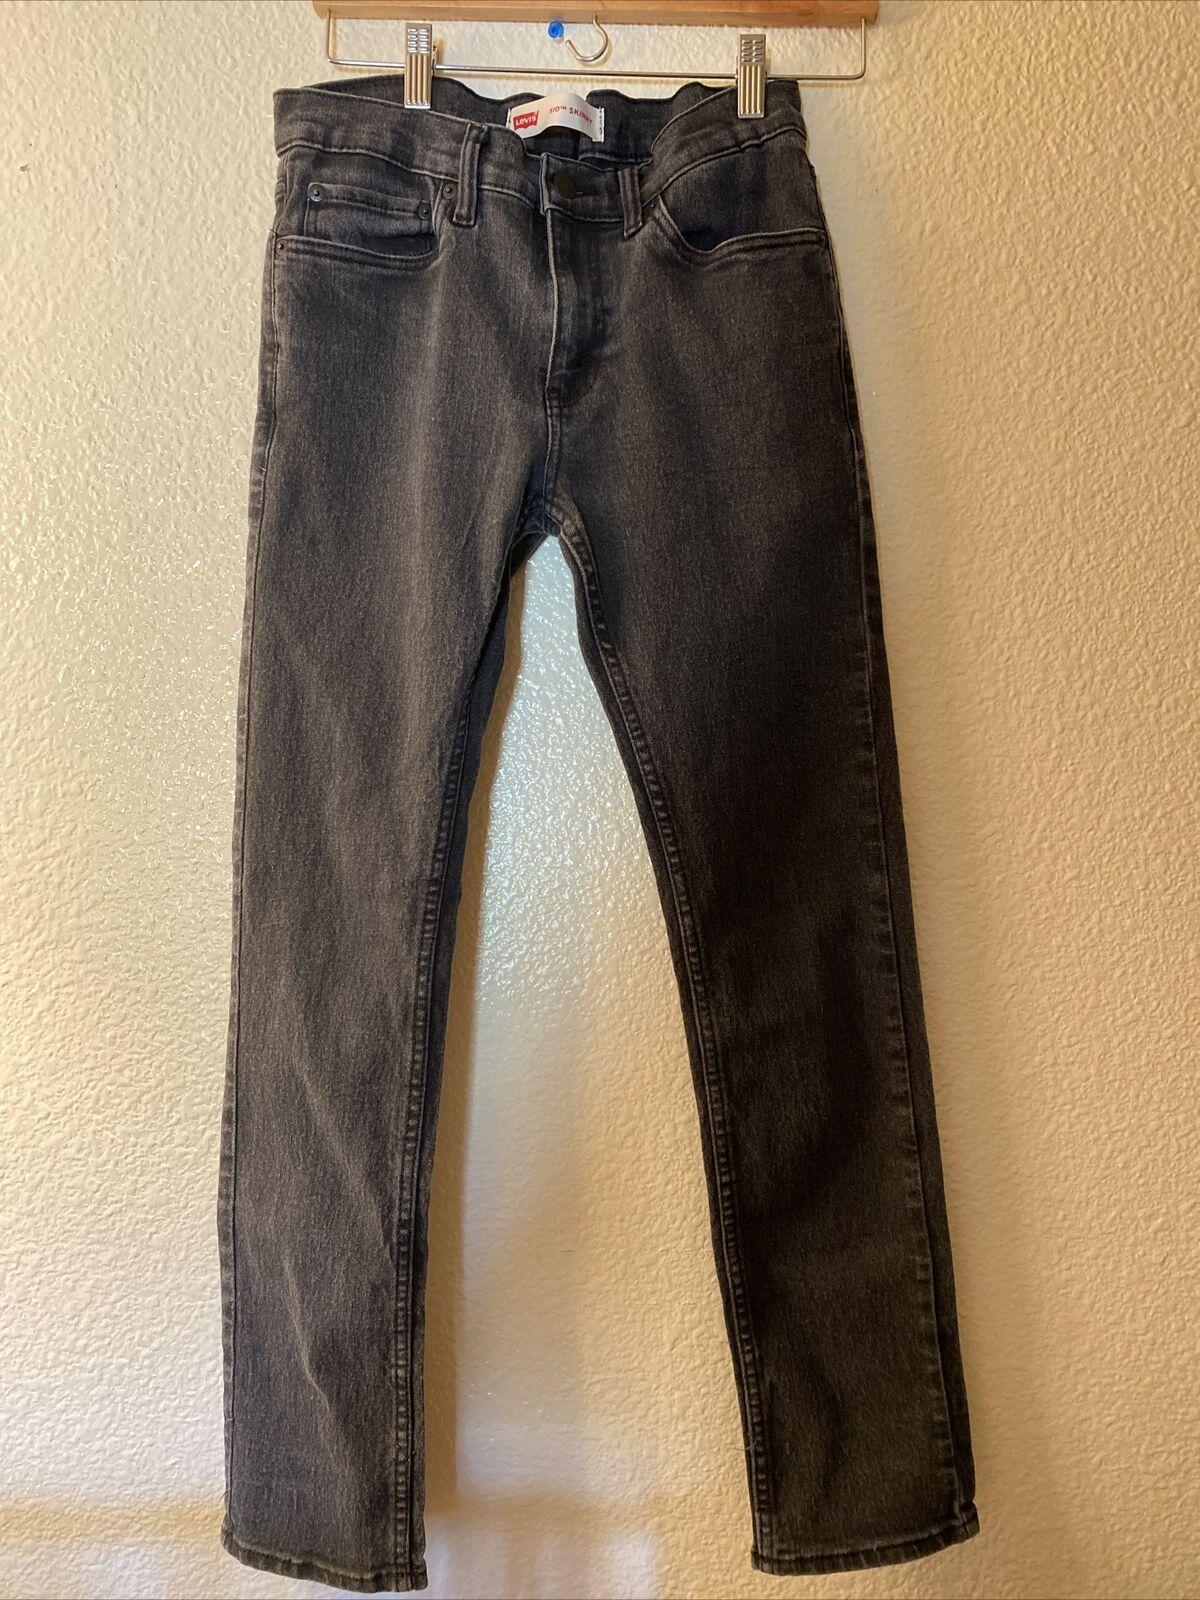 Levis 510 Skinny Black Jeans 28x28 - image 1